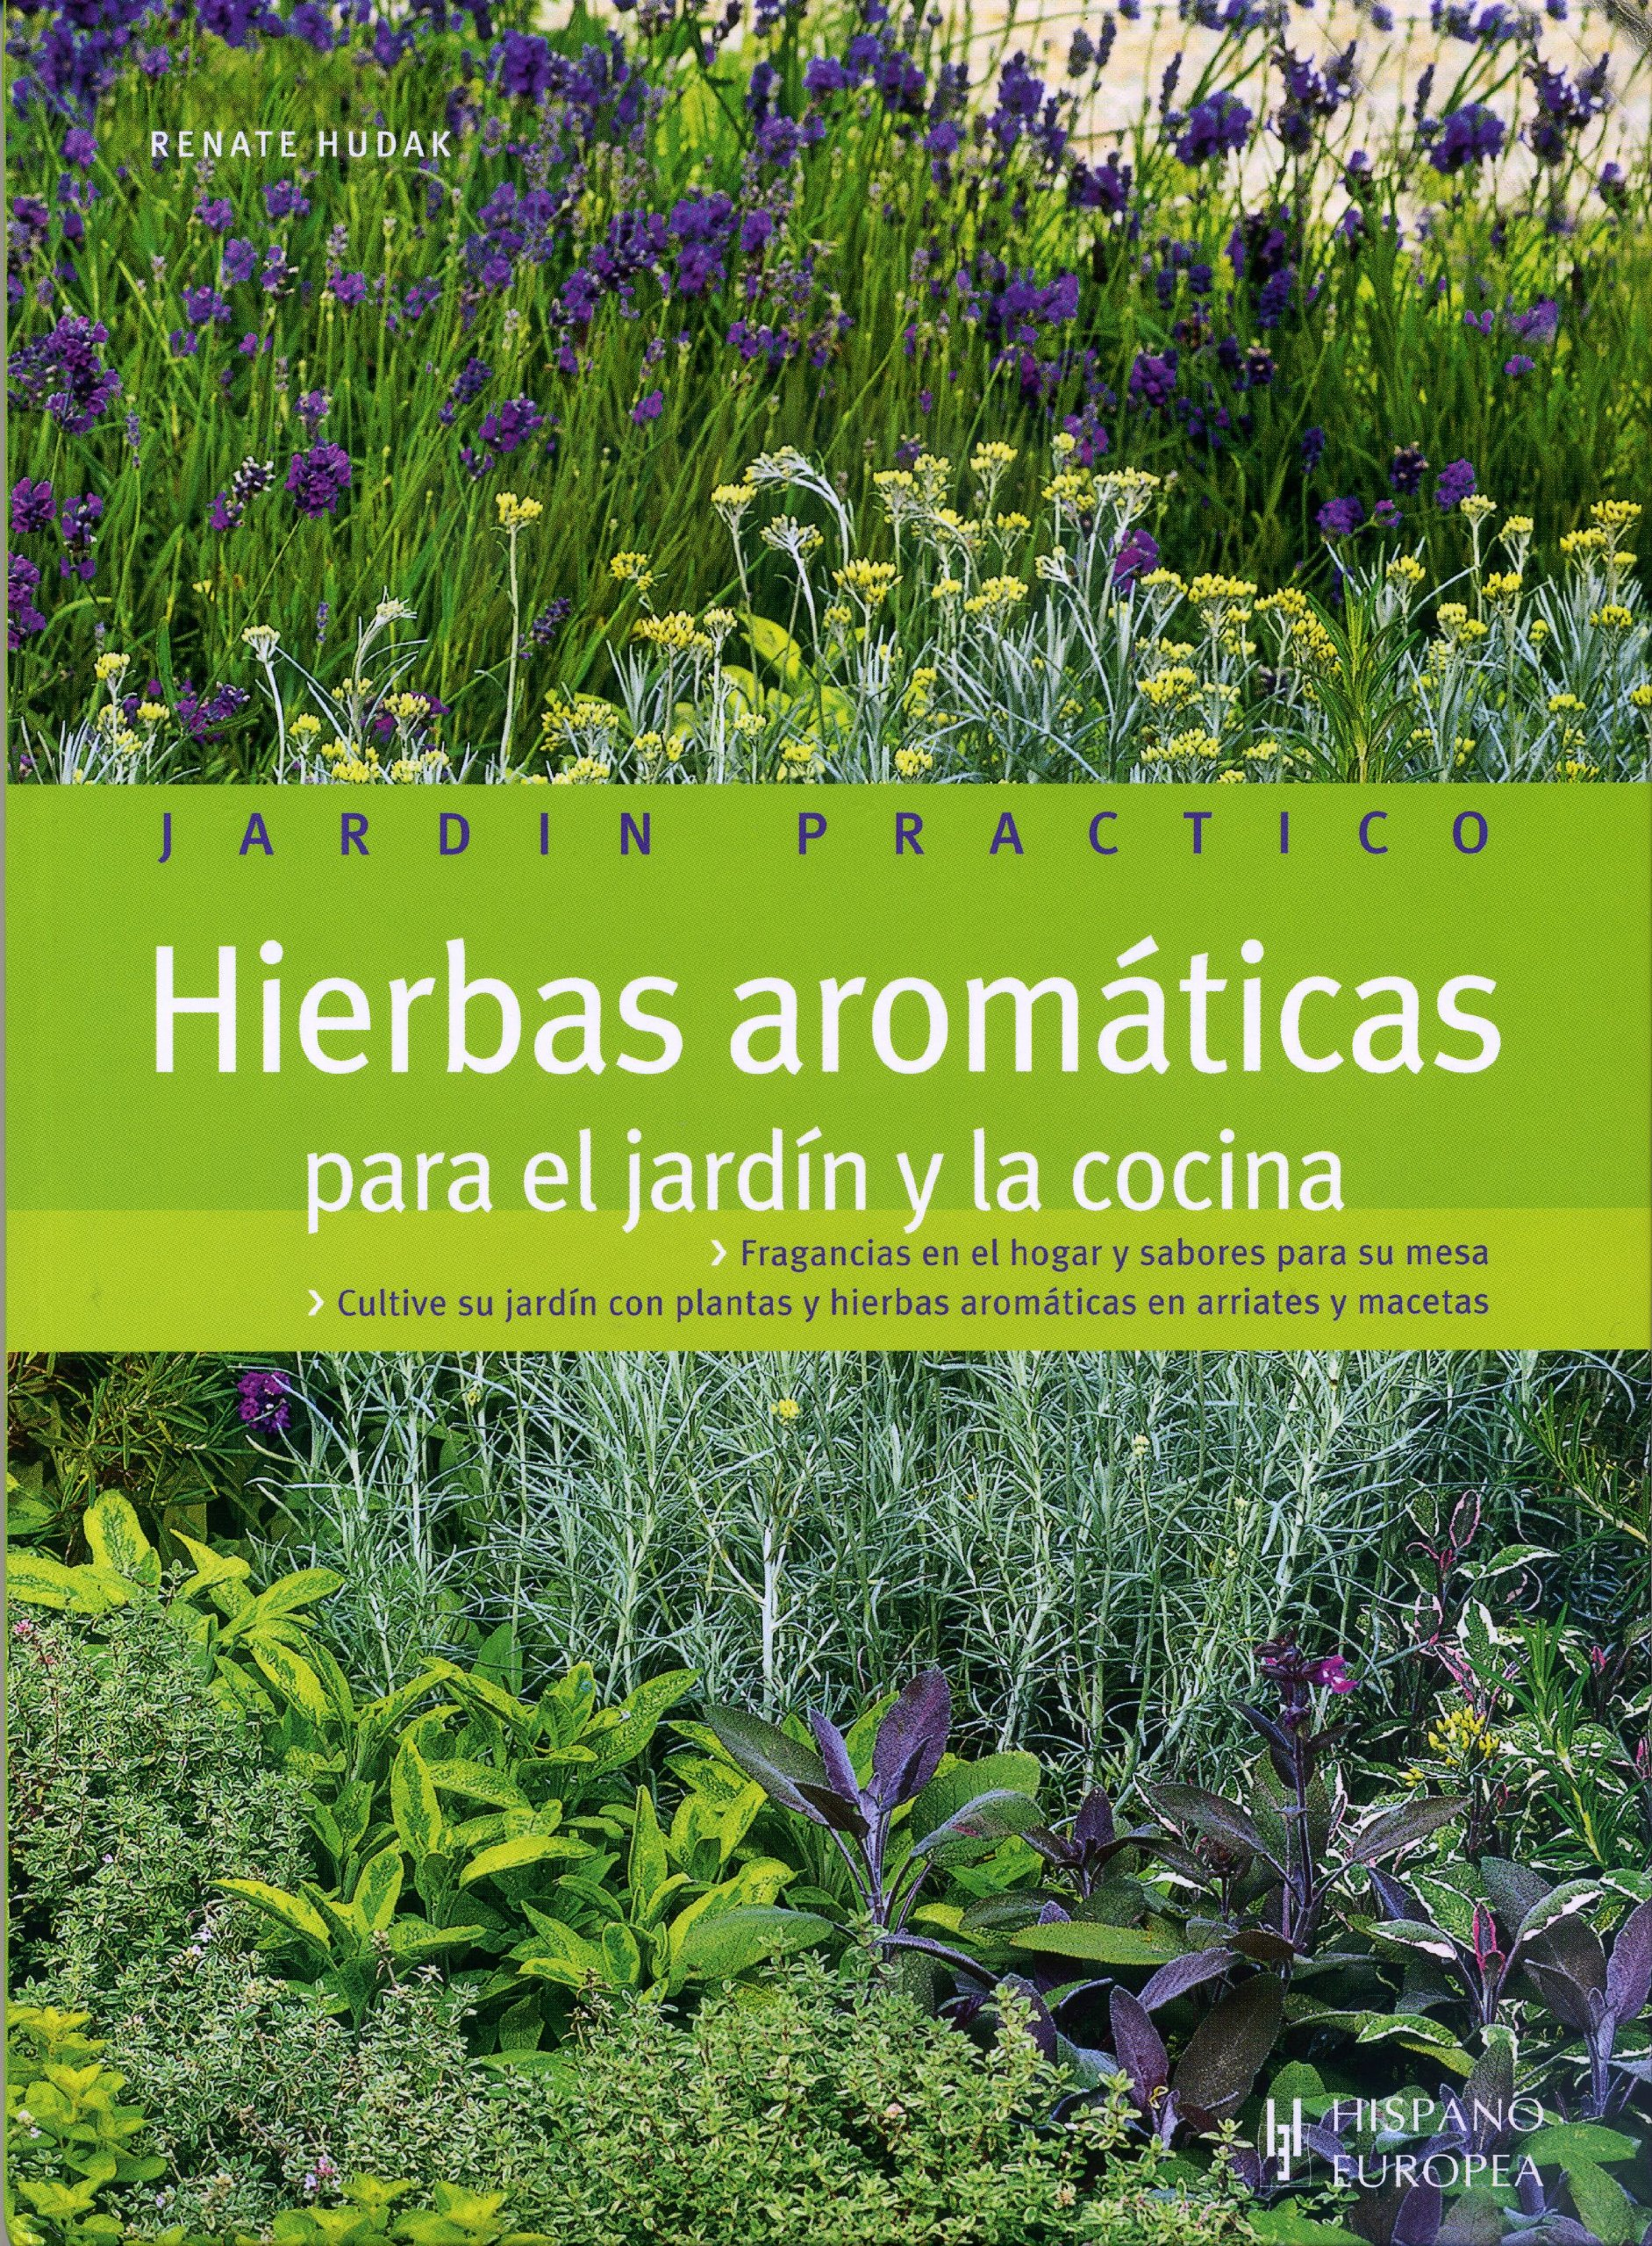 Plantas aromaticas de jardin plantas aromticas el for Plantas aromaticas jardin